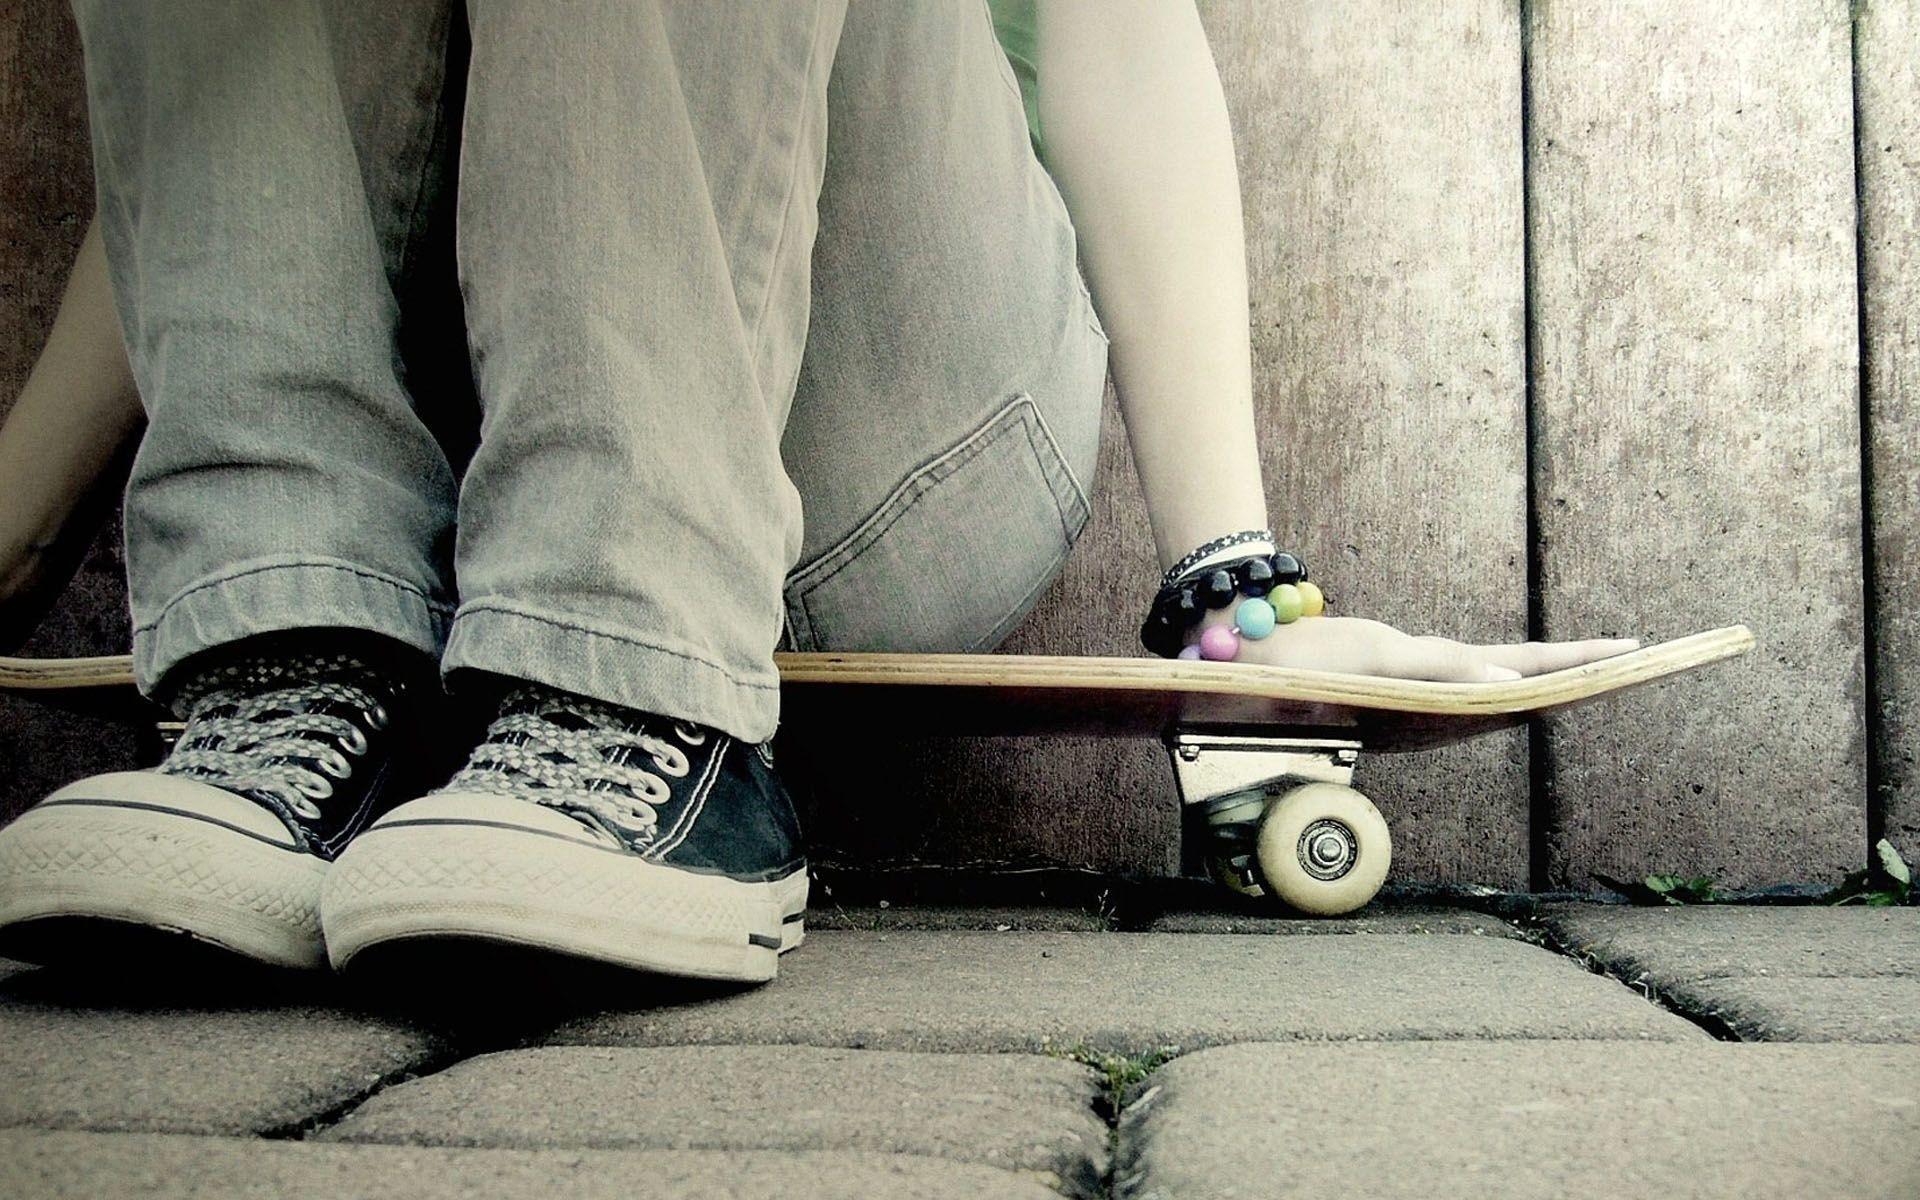 Skateboard Iphone Wallpaper